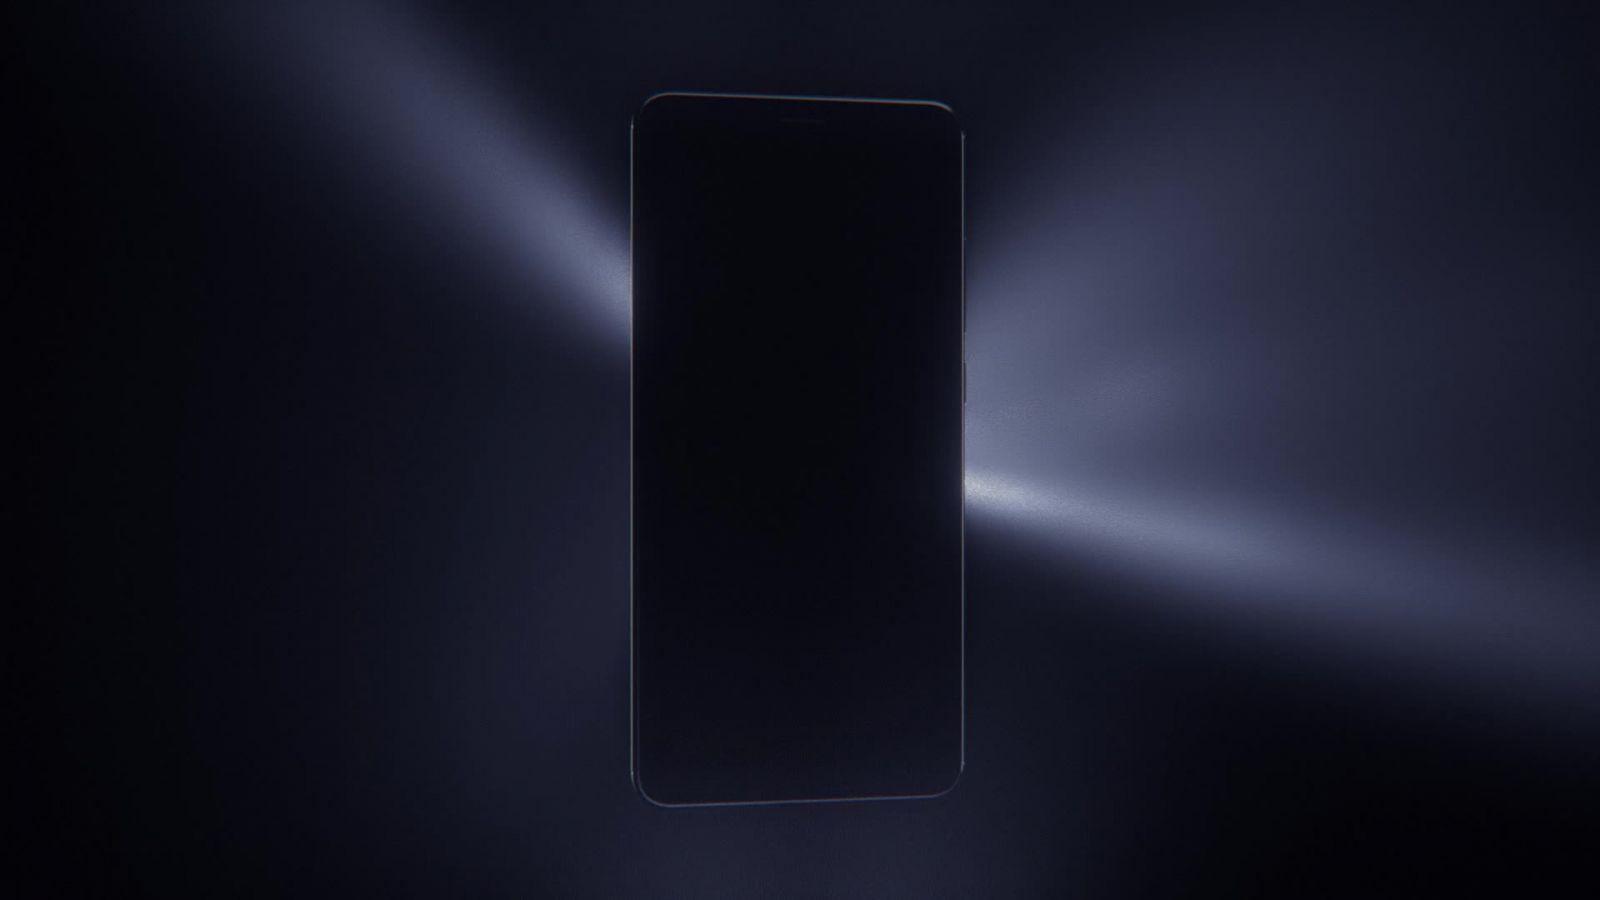 Xiaomi готовит смартфон с камерой 128 Мп и процессором Qualcomm (tb2.mawnicybunksnavxxcmsvxa 6000000006226 0 tbvideo)